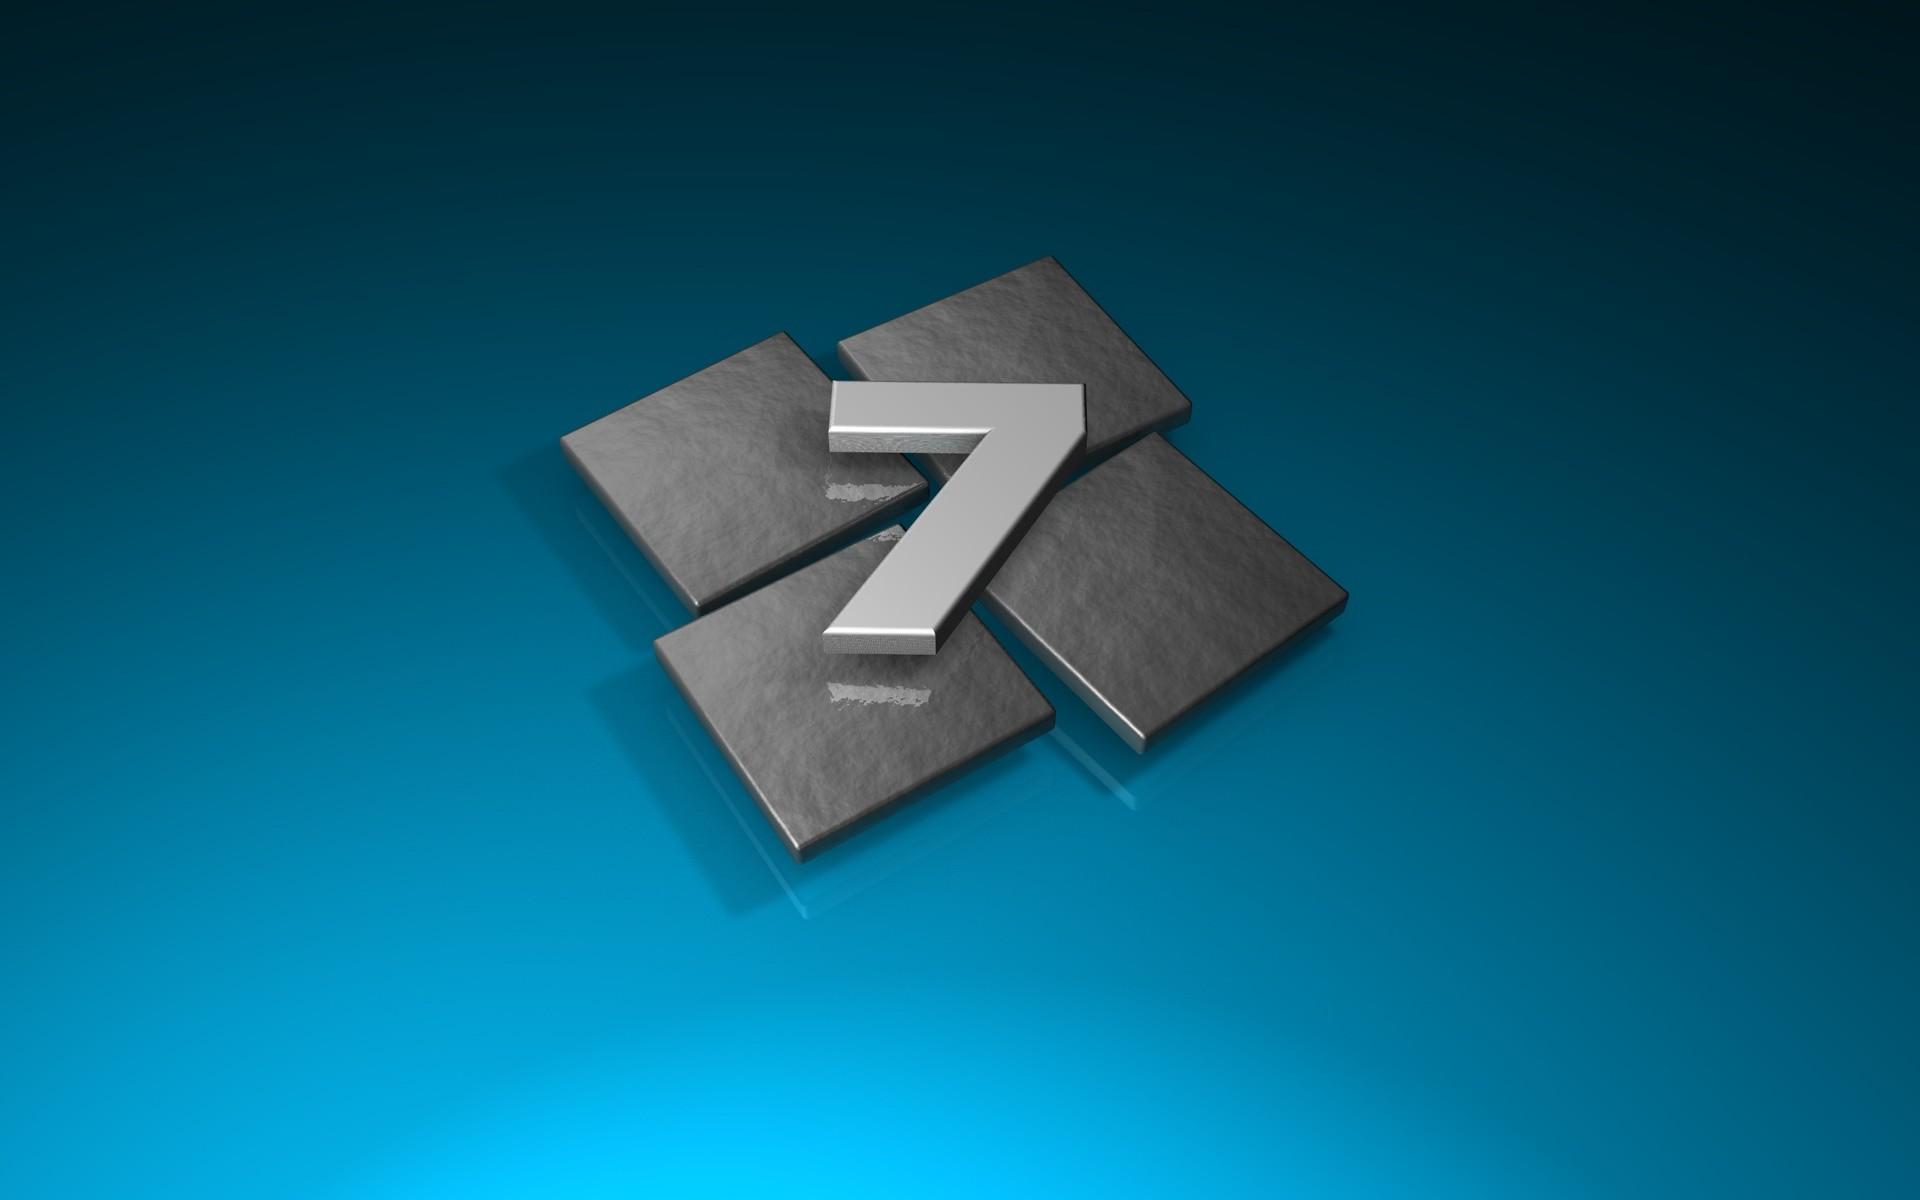 Windows Seven 7 Wide HD – https://imashon.com/brands-logos/windows-seven-7-wide-hd.html  | WallPapers | Pinterest | Wallpaper